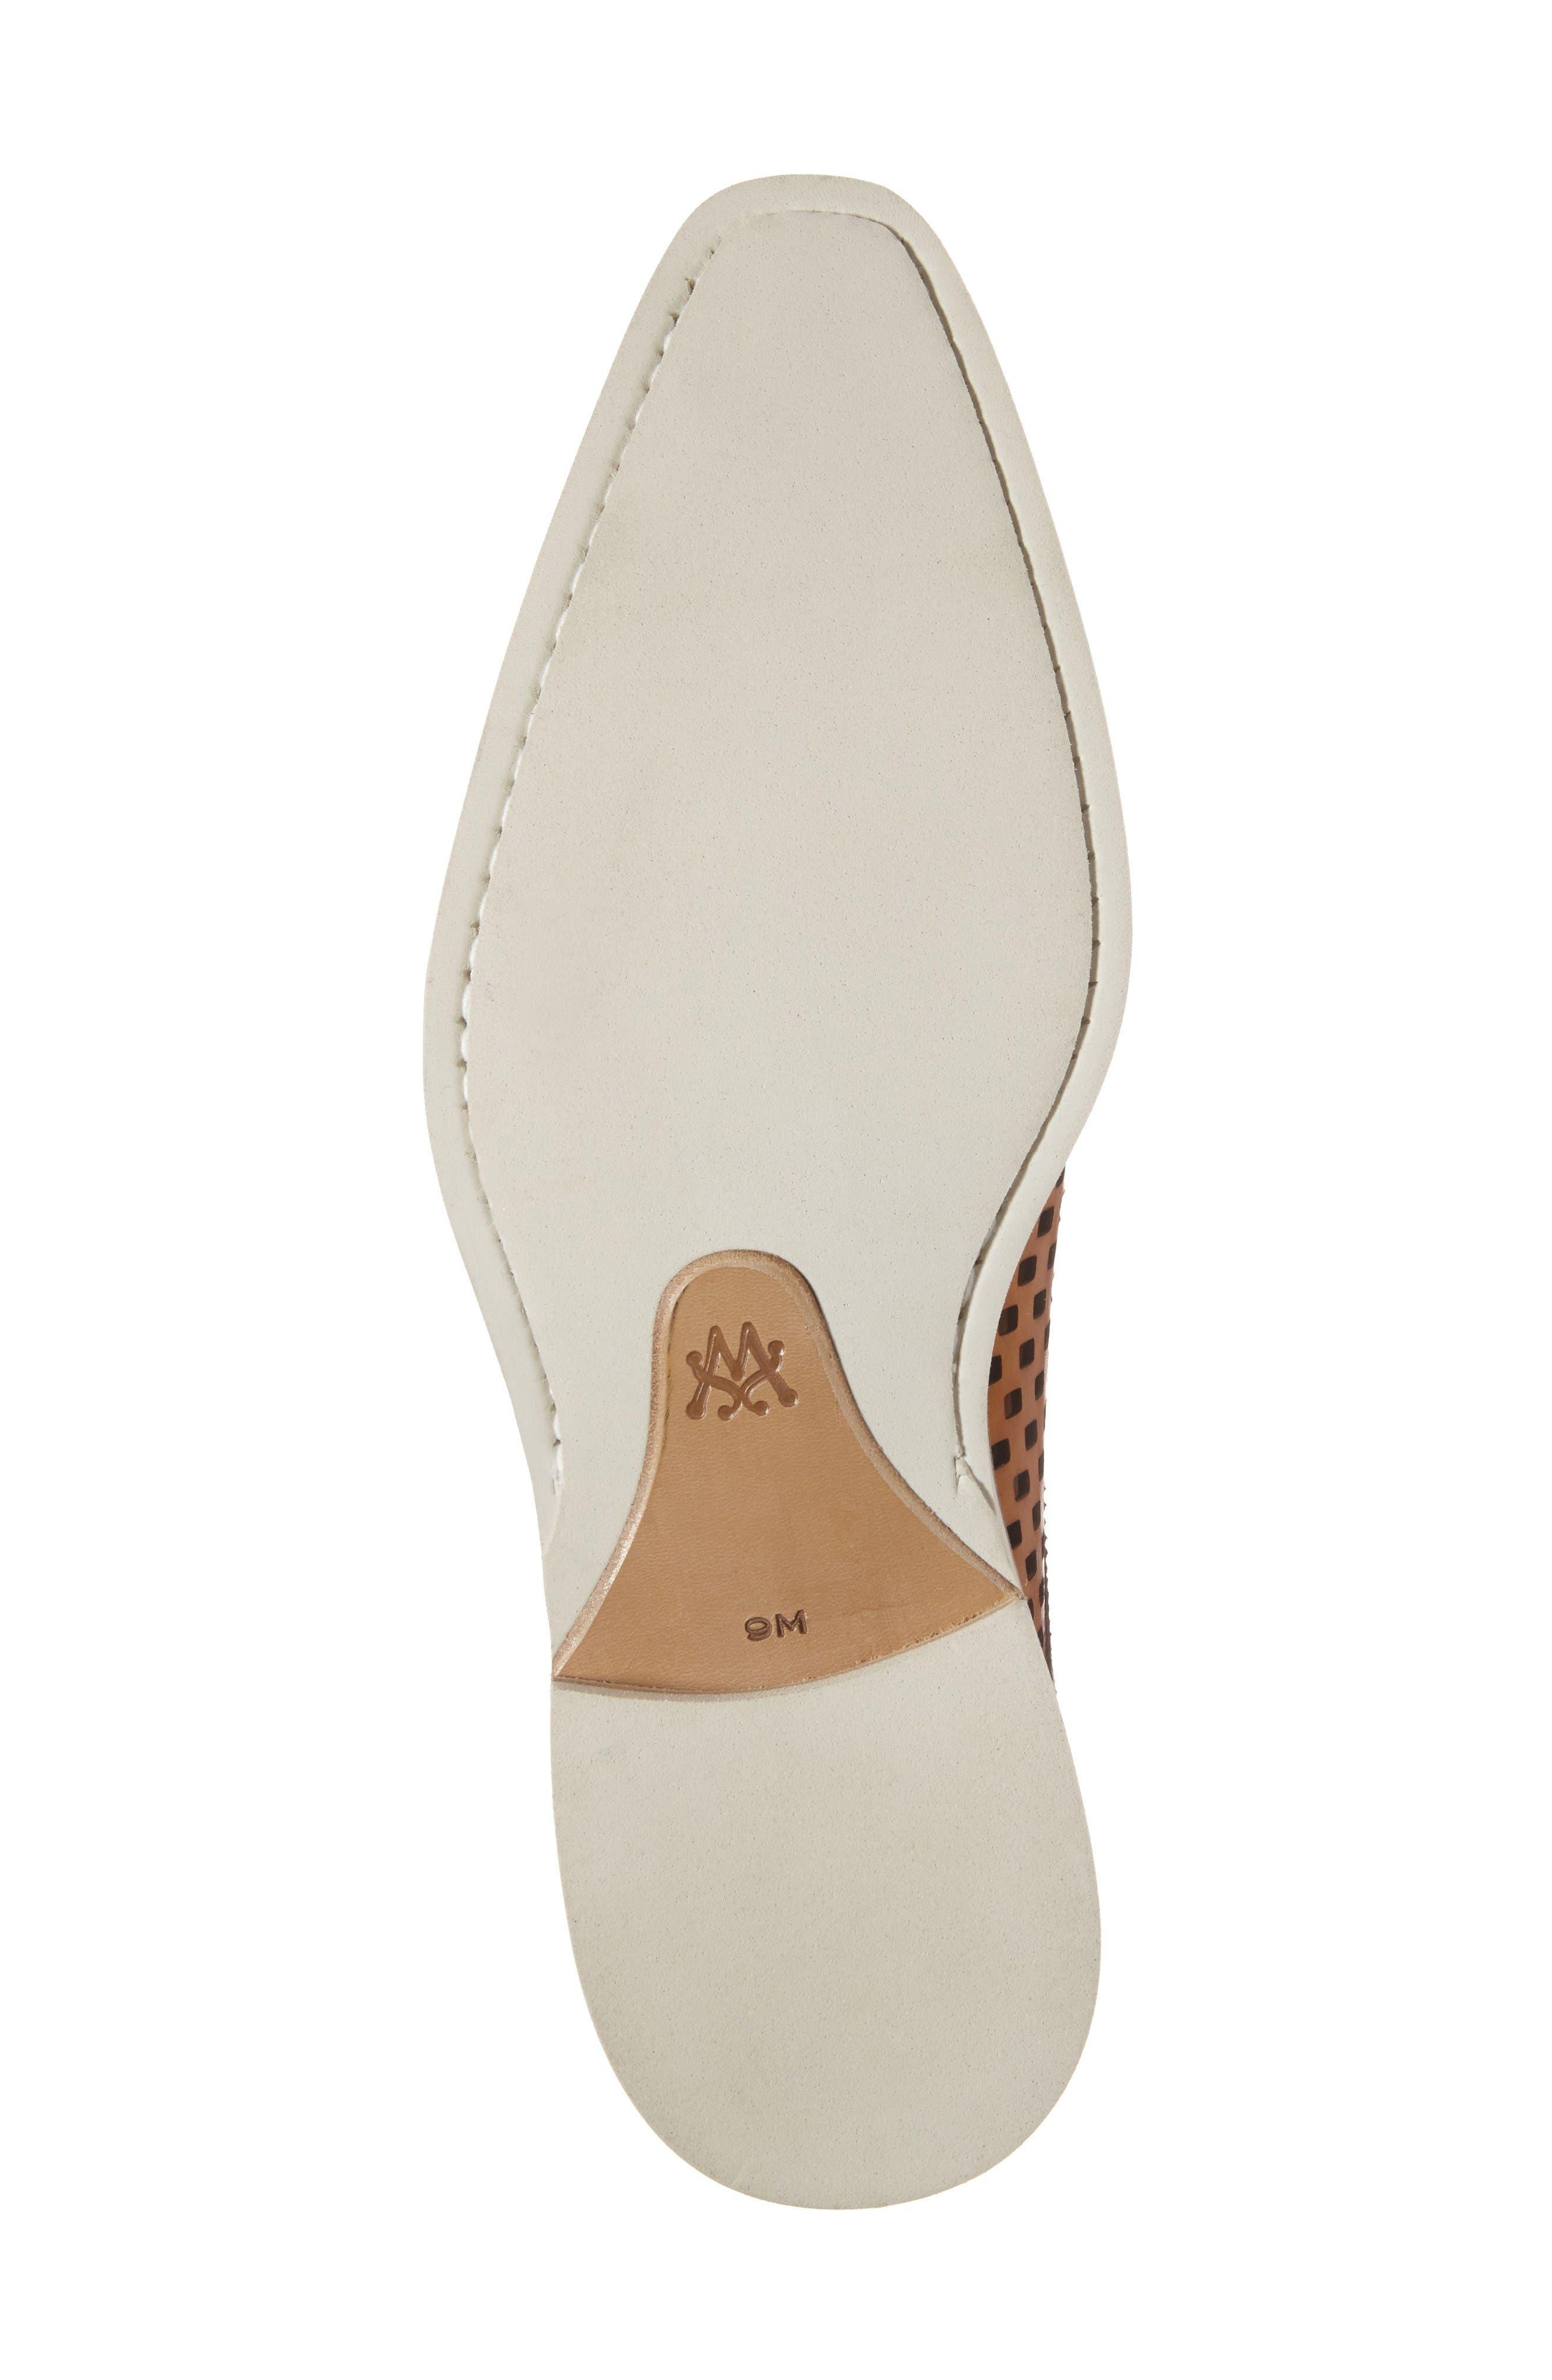 Alvarez Spectator Shoe,                             Alternate thumbnail 6, color,                             Cognac Multi Leather